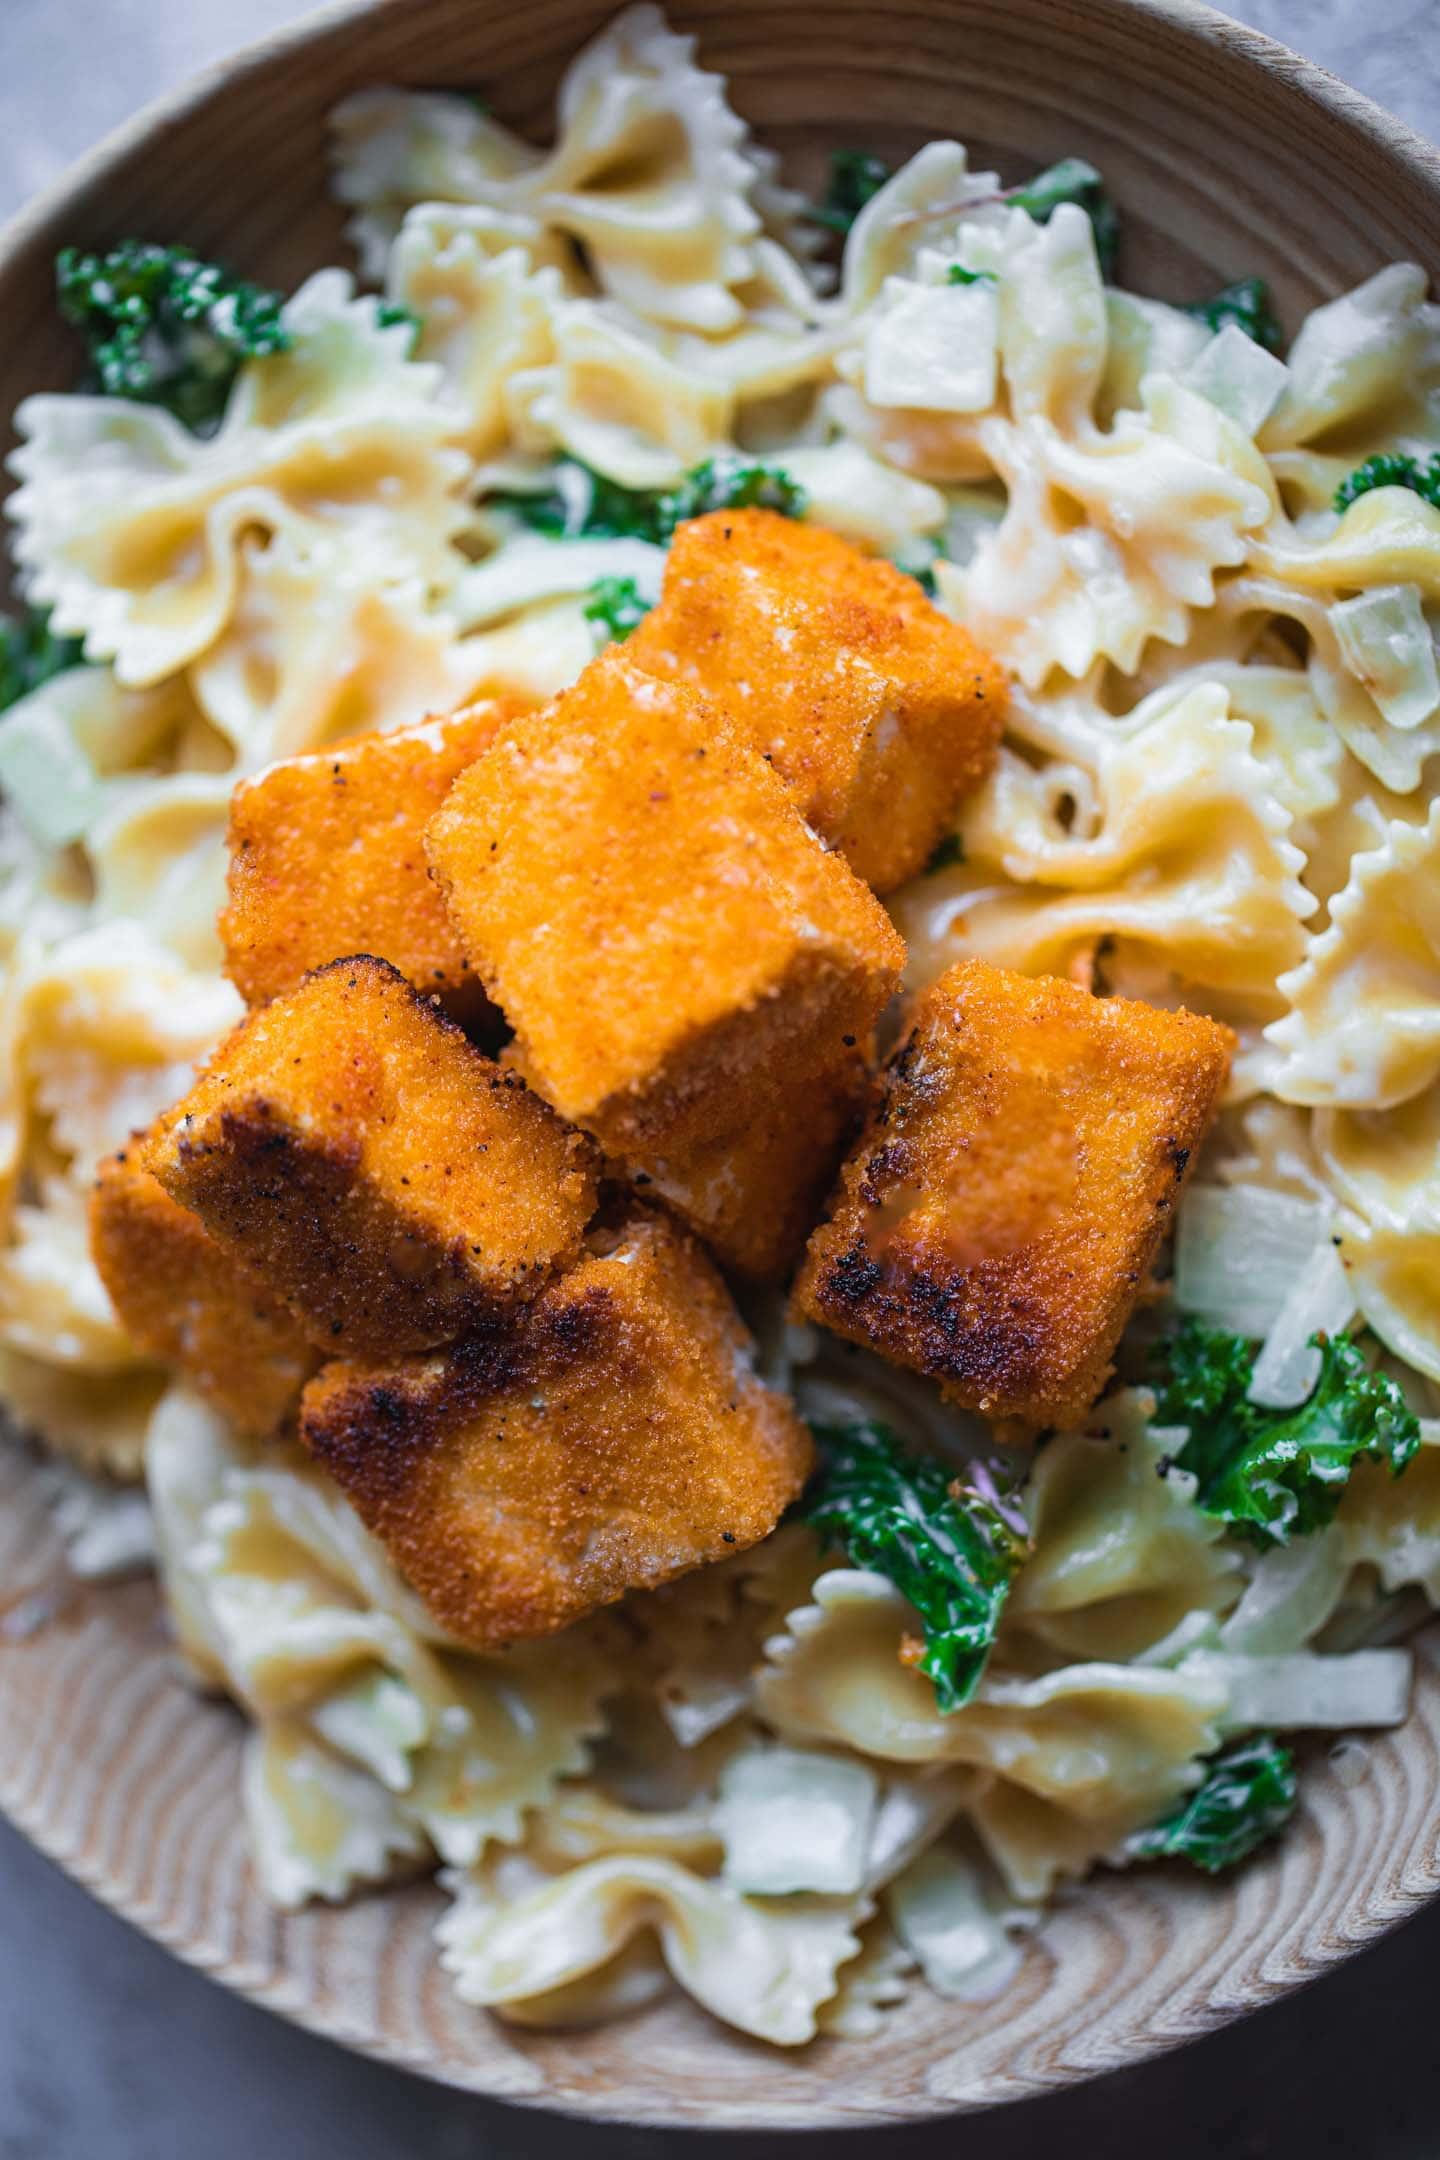 Easy vegan crispy tofu baked or fried-